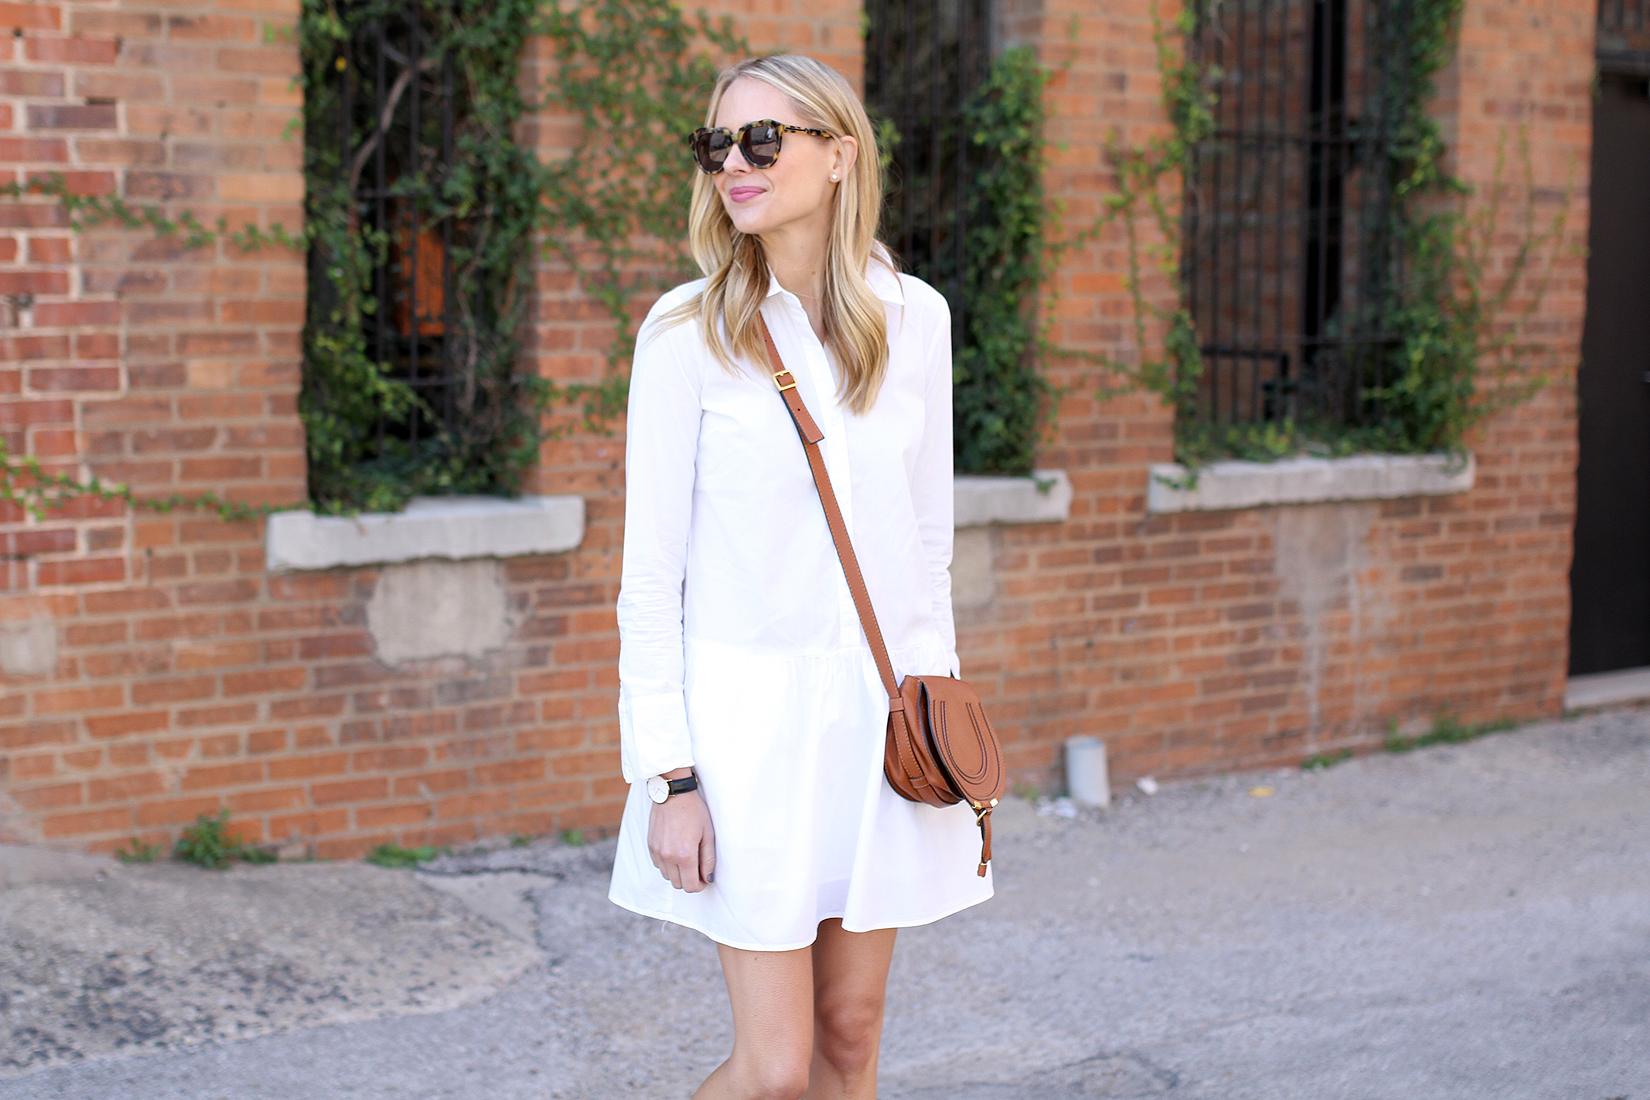 fashion-jackson-splendid-damsel-white-shirt-dress-karen-walker-sunglasses-chloe-marcie-tan-crossbody